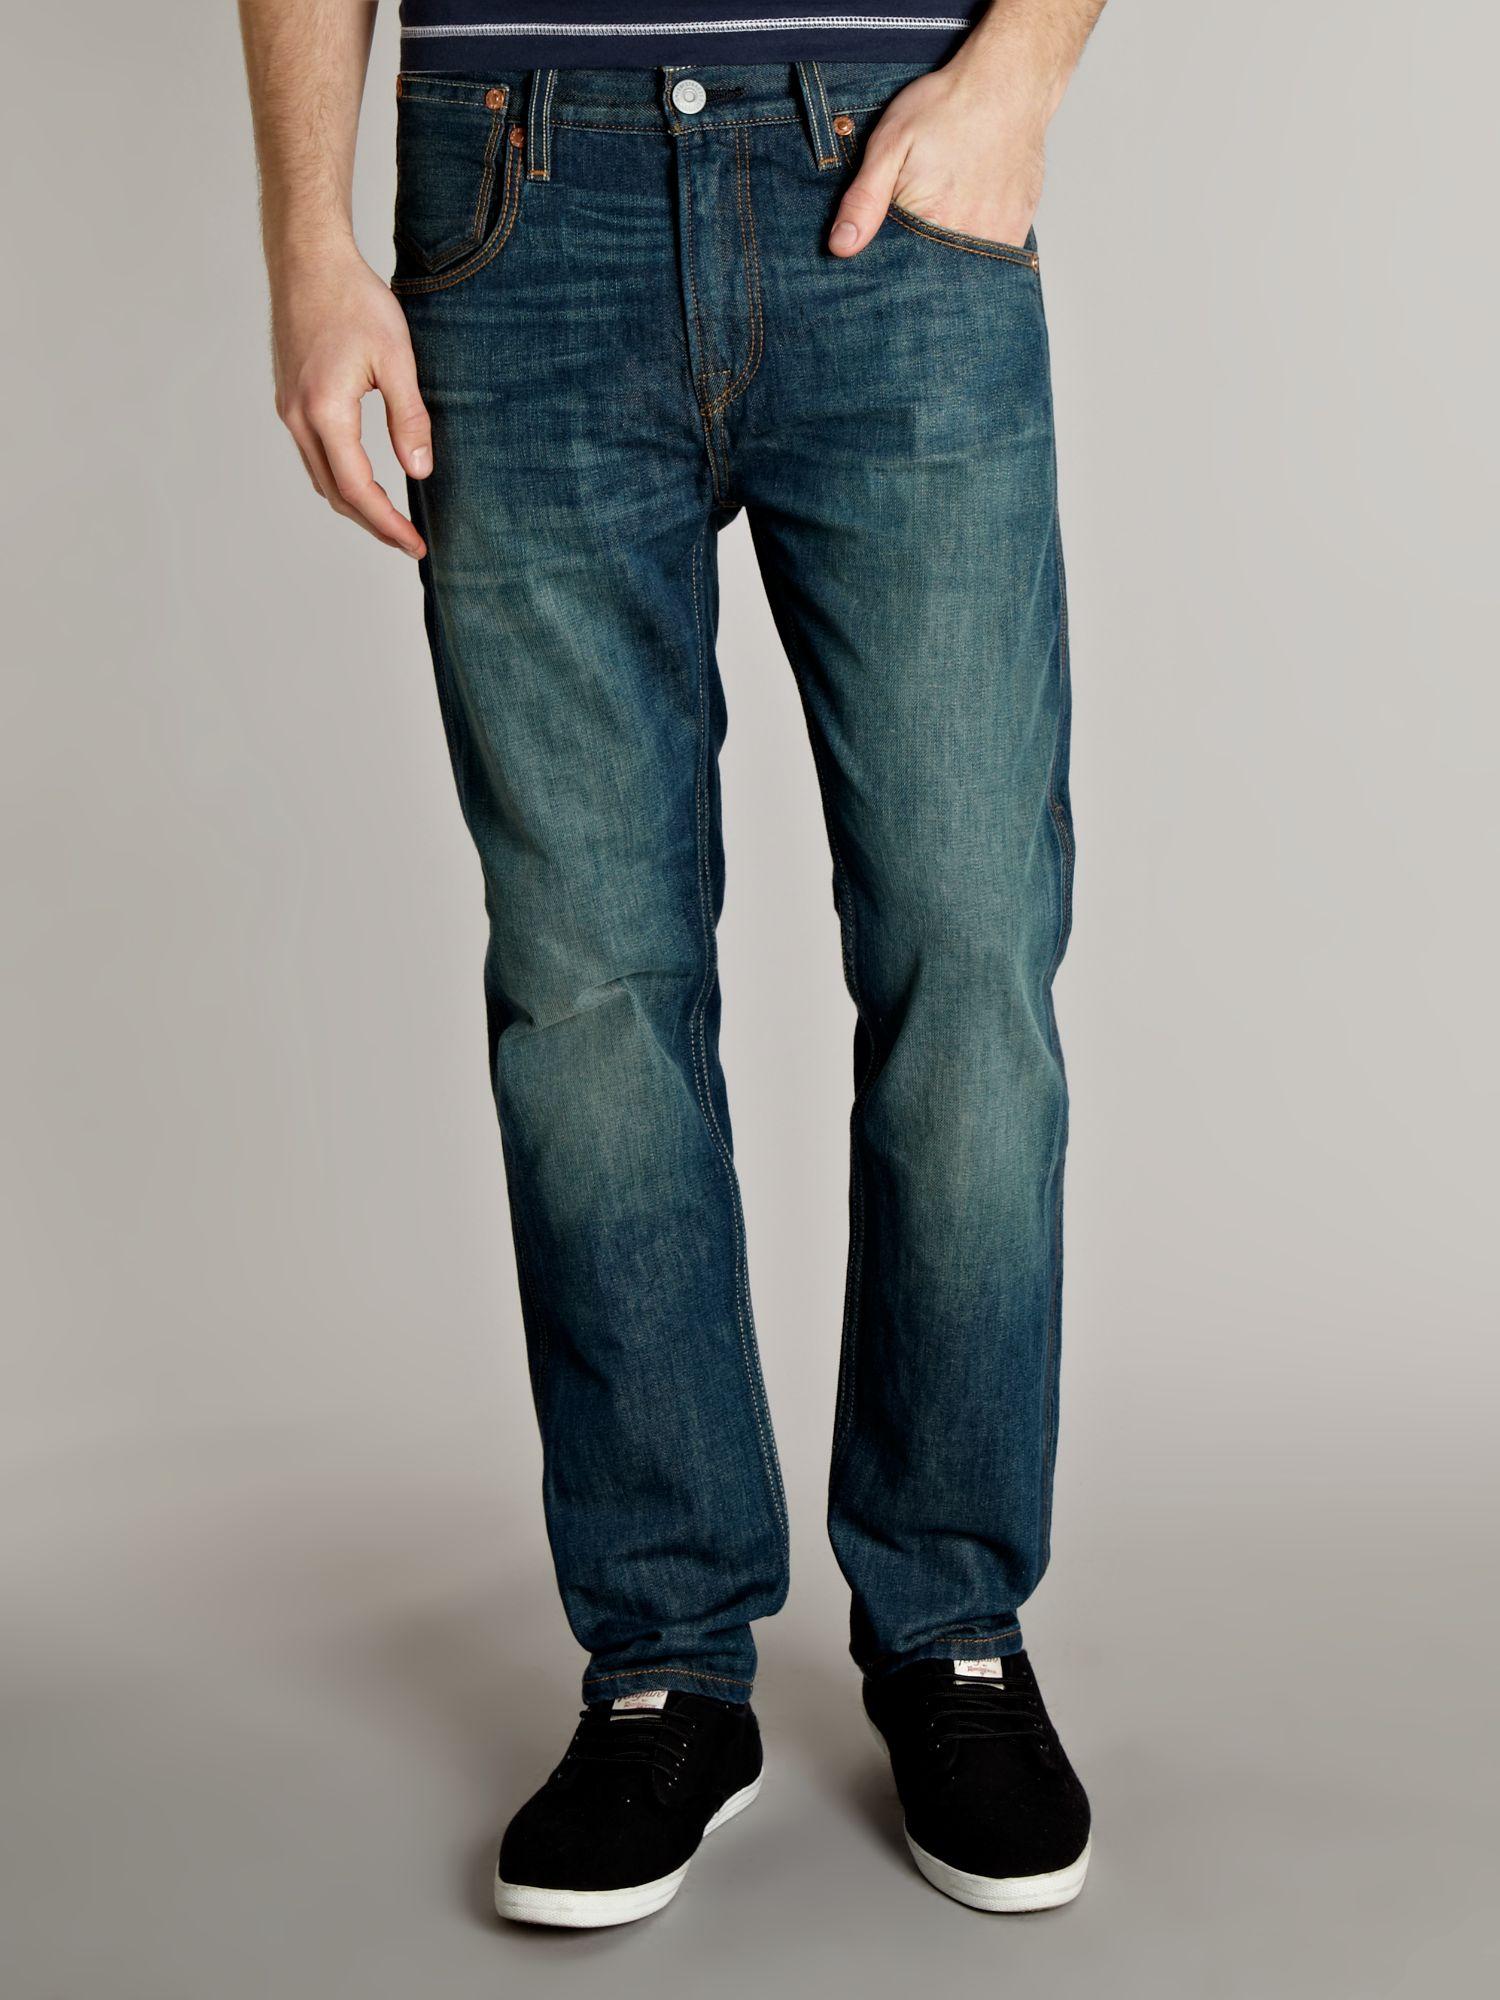 "Levi's Cotton 514 Slim Straight Leg Jean - 30-36"" Inseam in Denim Mid Wash (Blue) for Men"